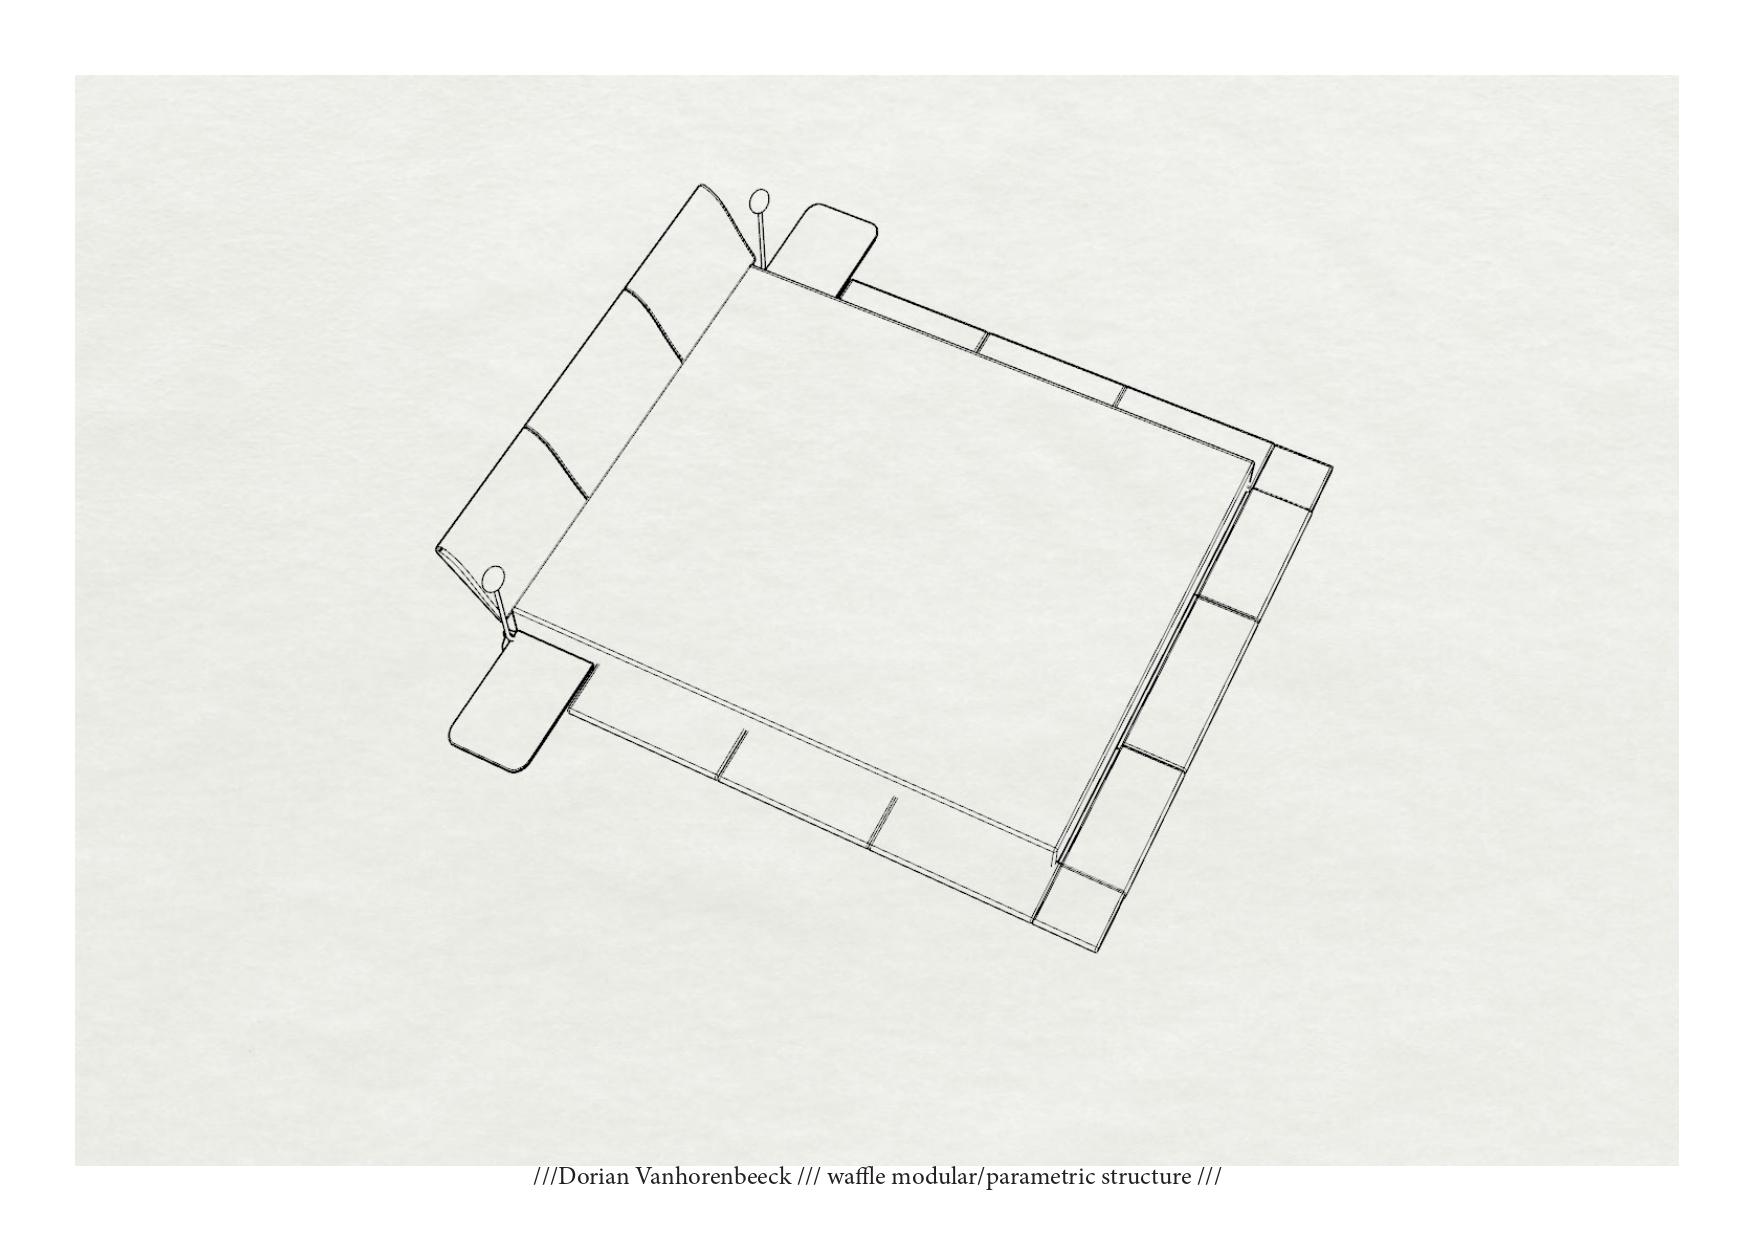 Livret Waffle modular-parametric Structure Dorian Vanhorenbeeck_page-0003